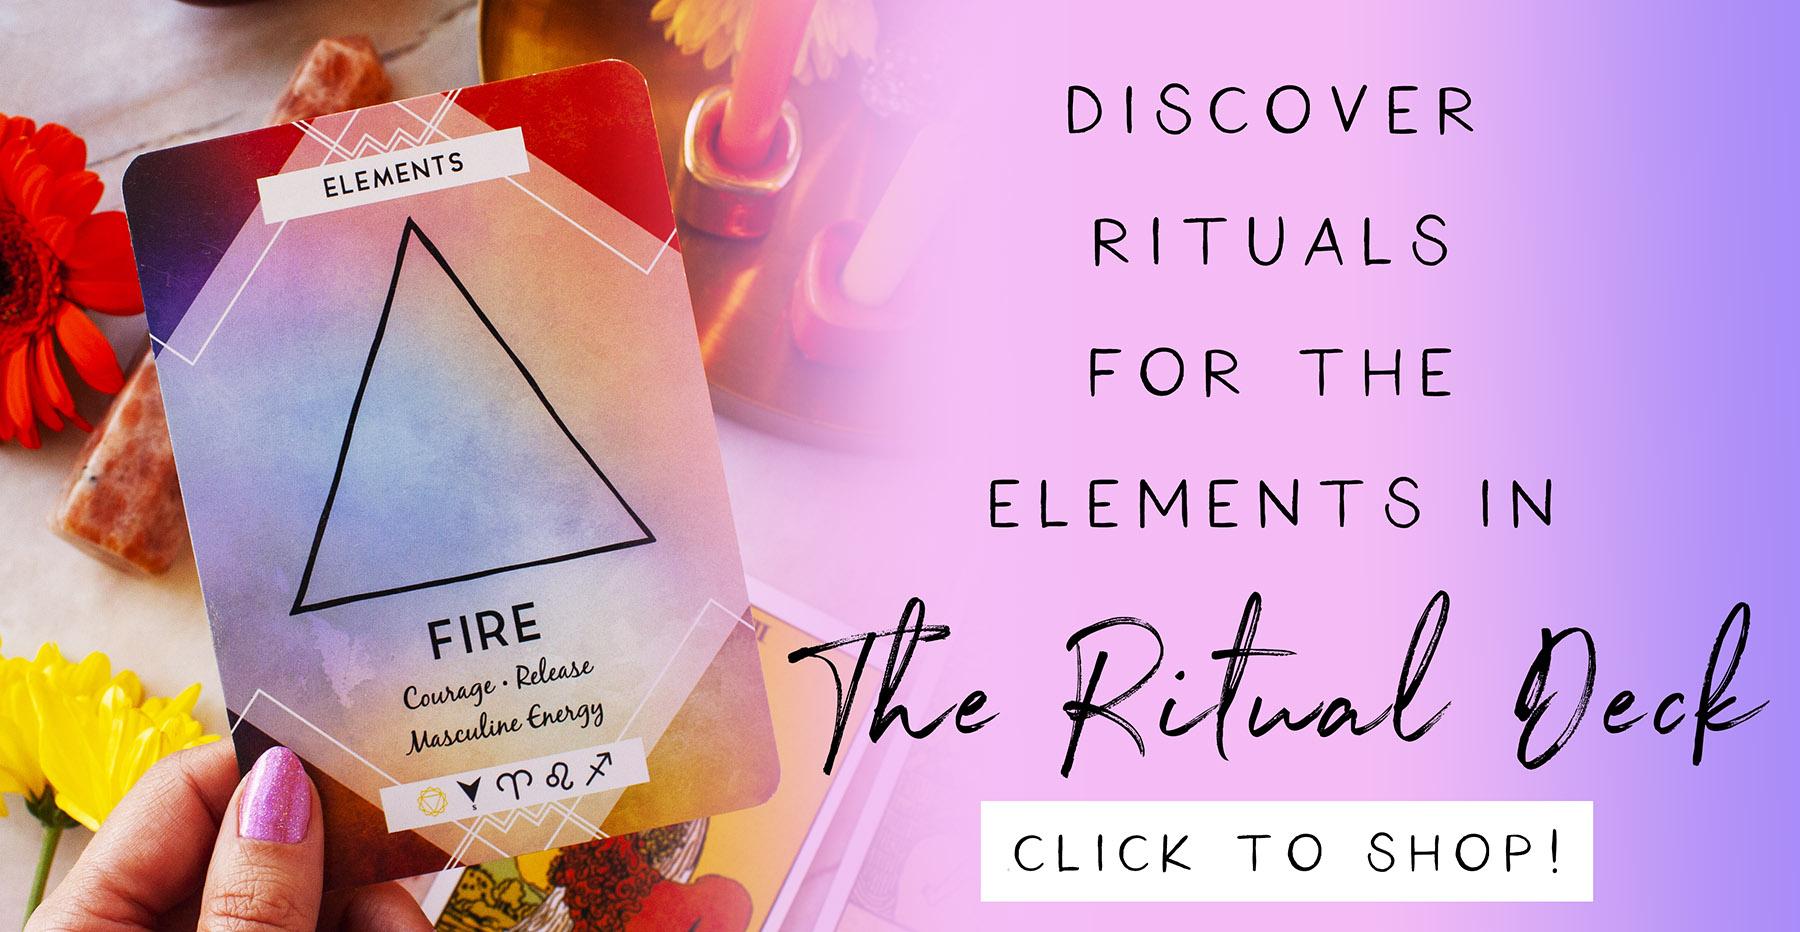 elements ad